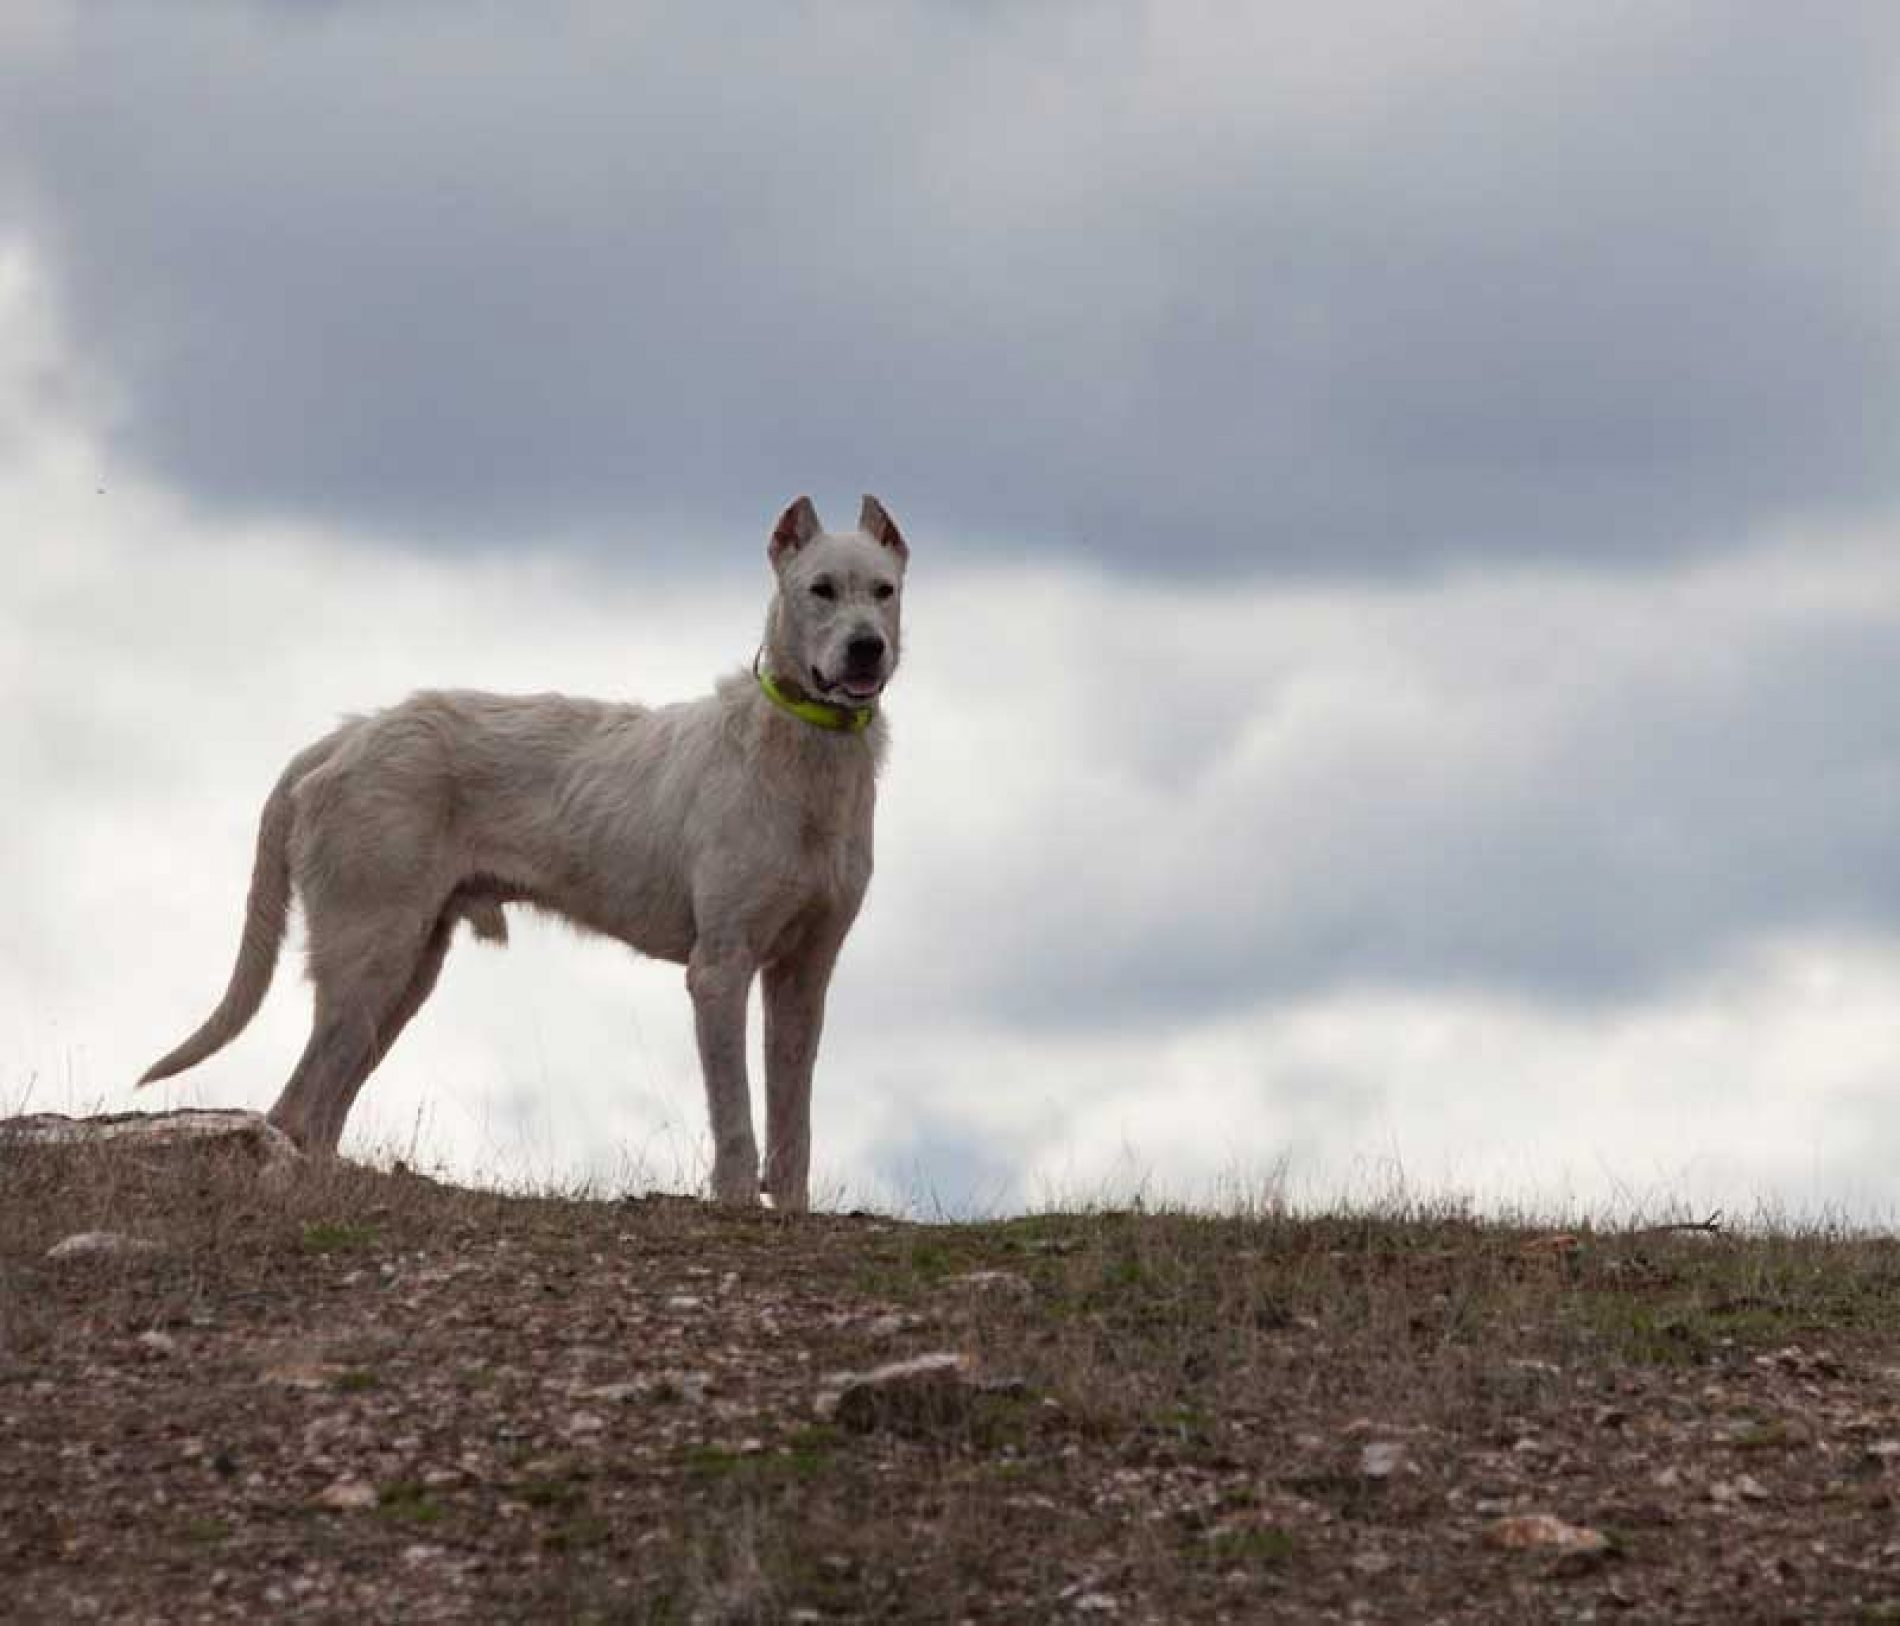 Novedades en materia de desparasitación de perros de caza en Extremadura